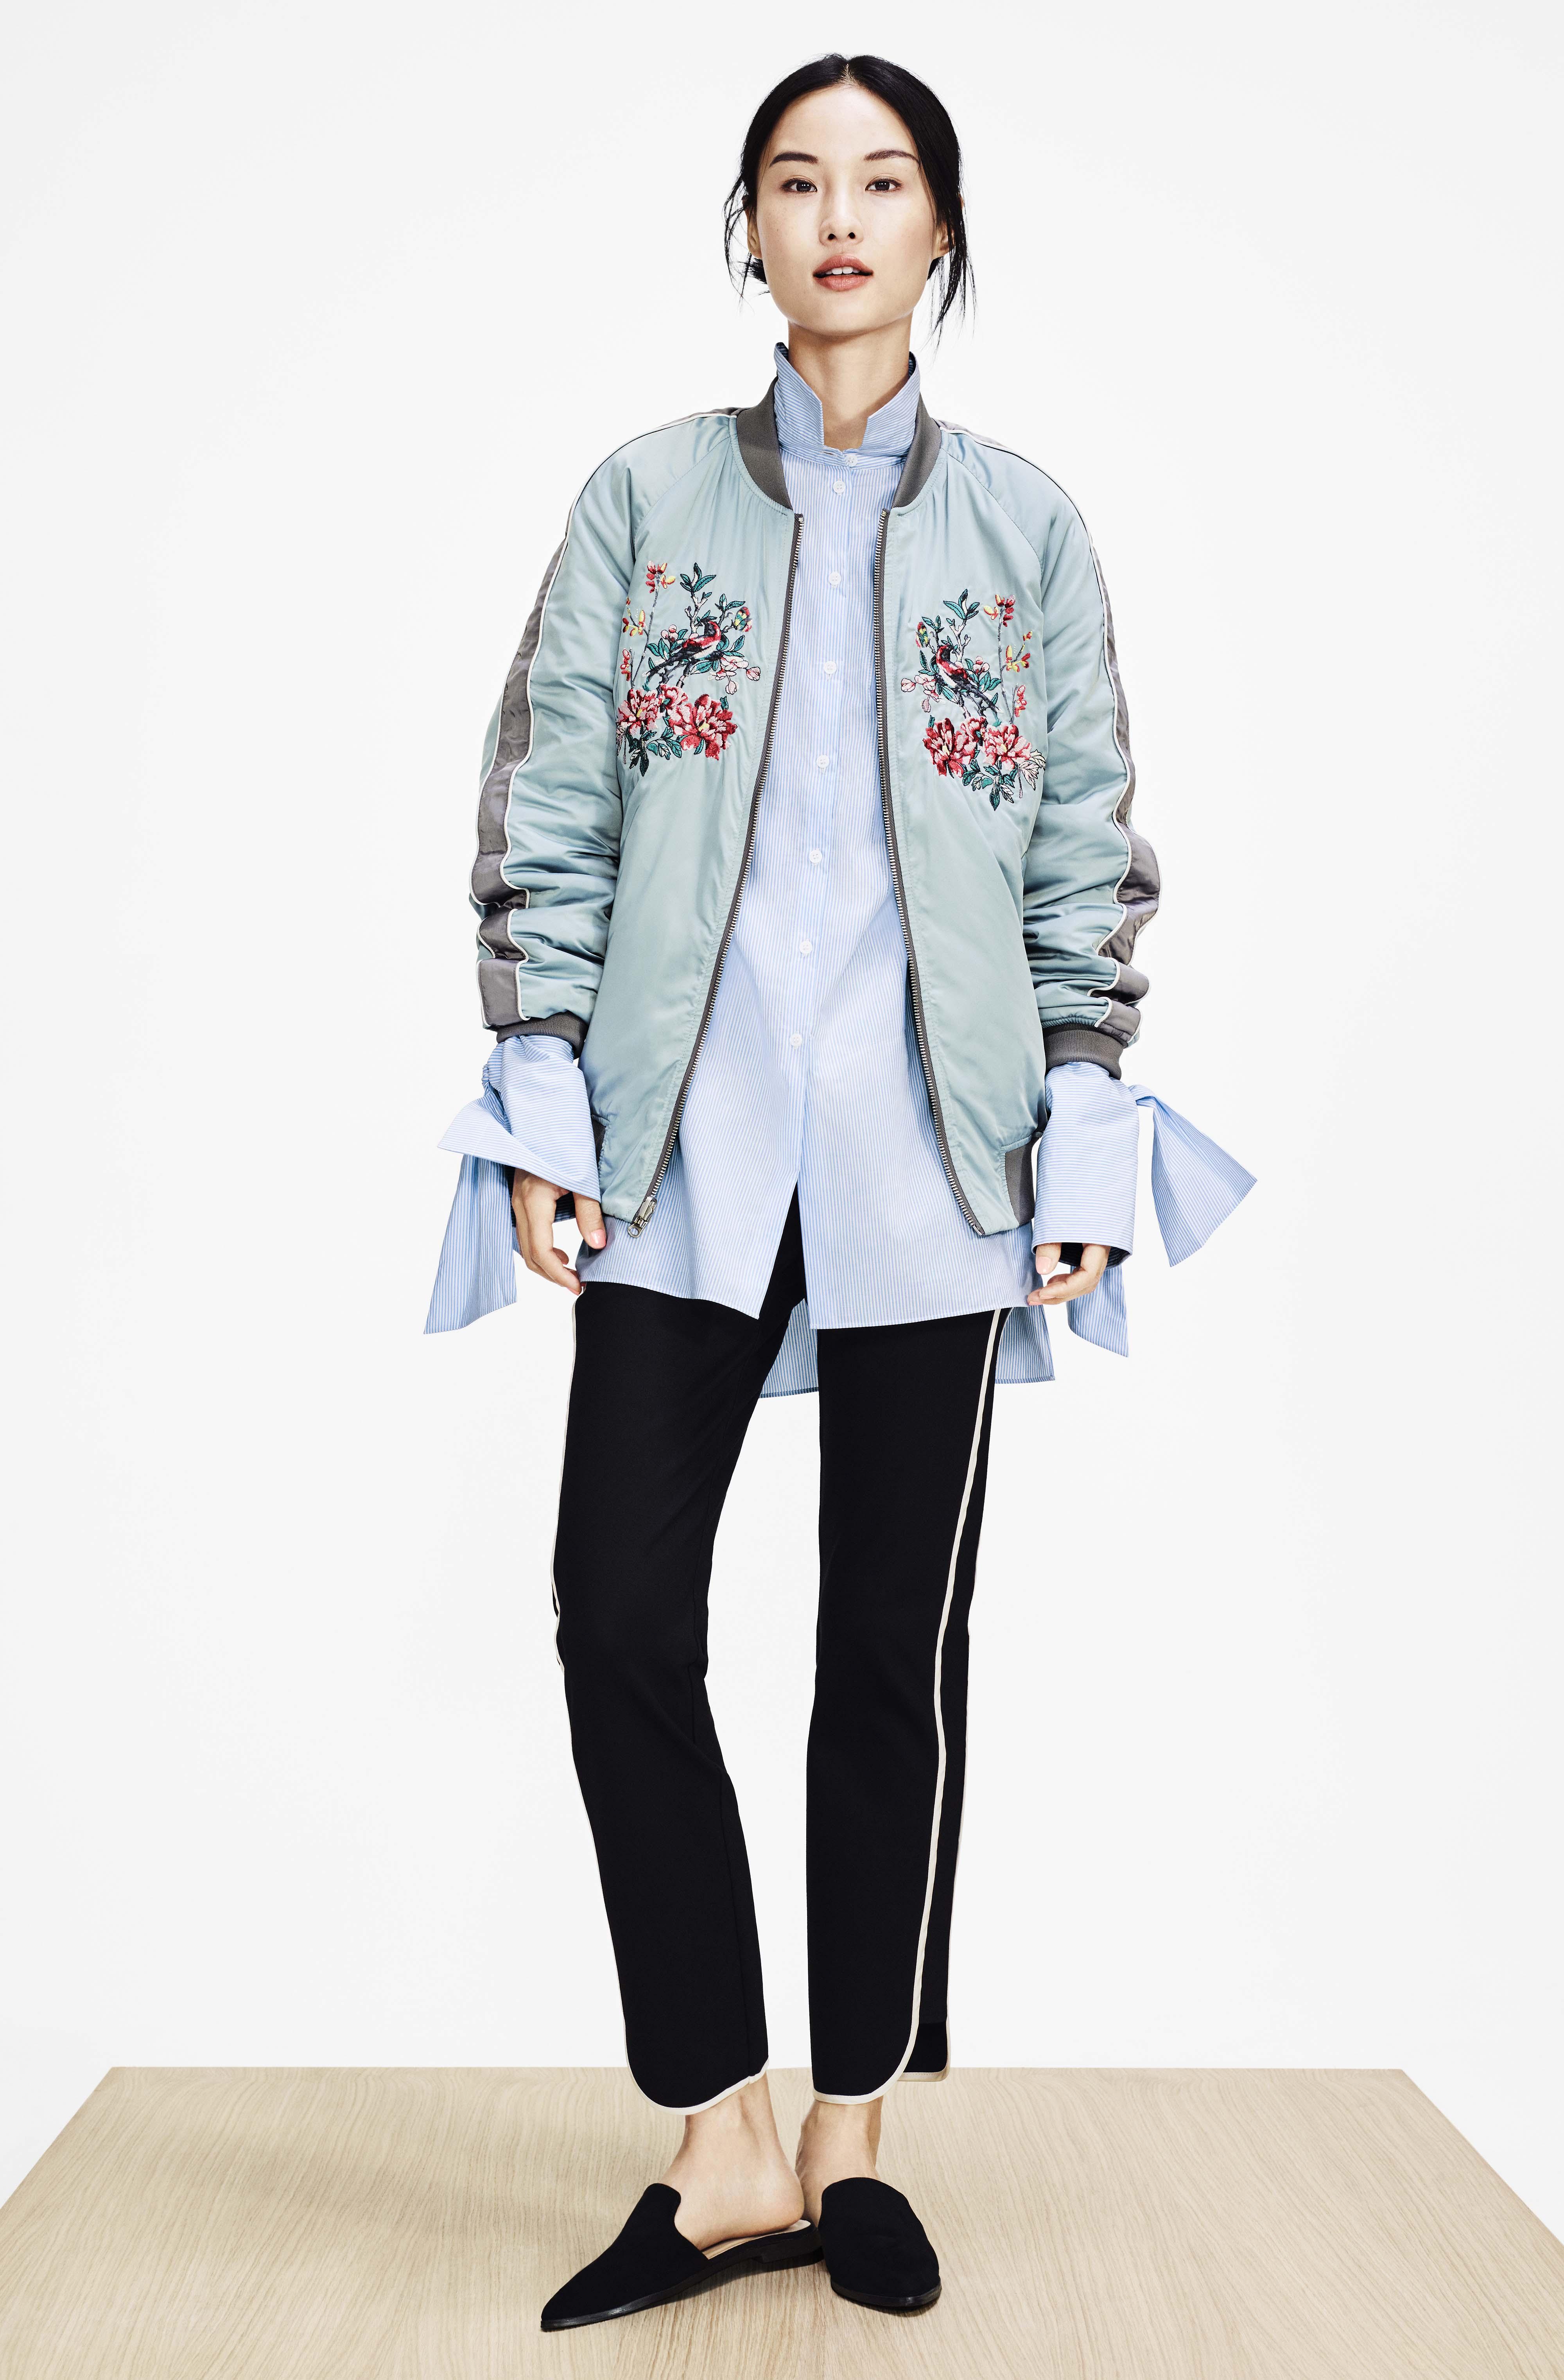 Fashion lookbook 2017 - Lindex Lookbook Ss17 Lindex Lookbook Ss17 1